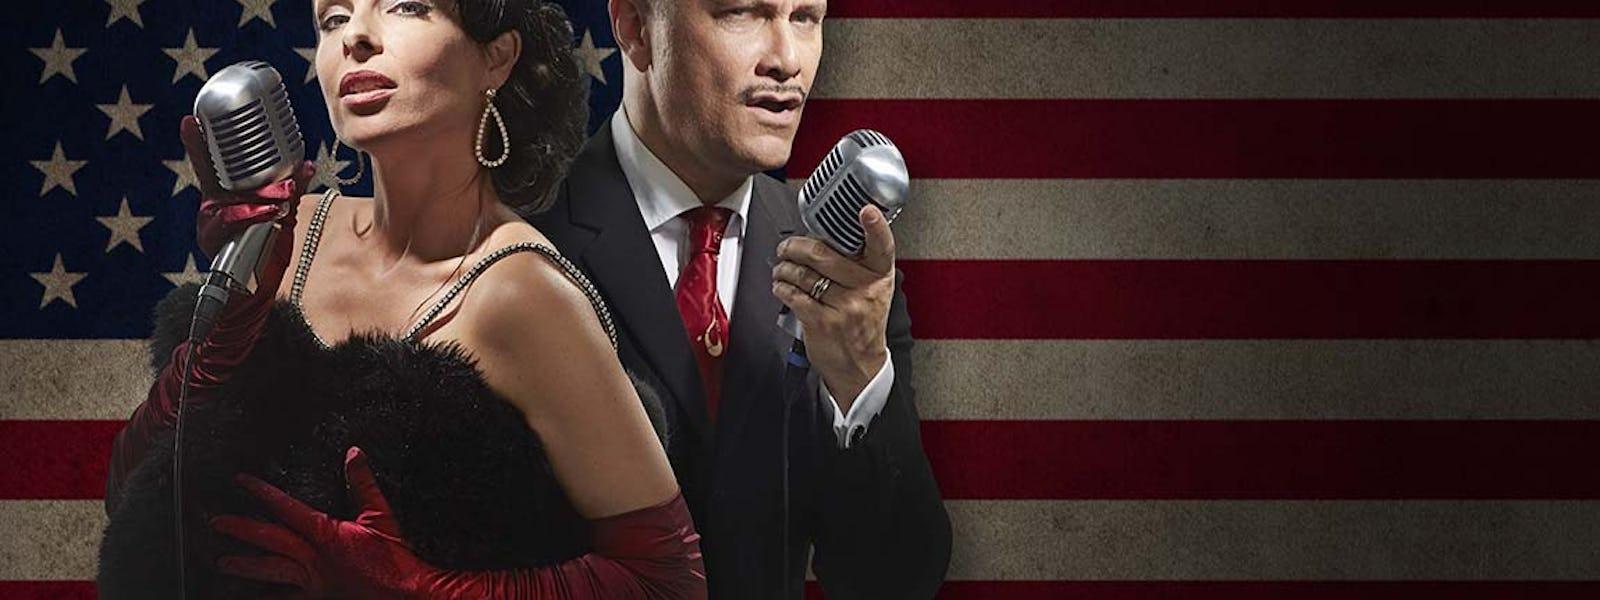 Bild - Laszlo & Tear - The American Songbook på svenska